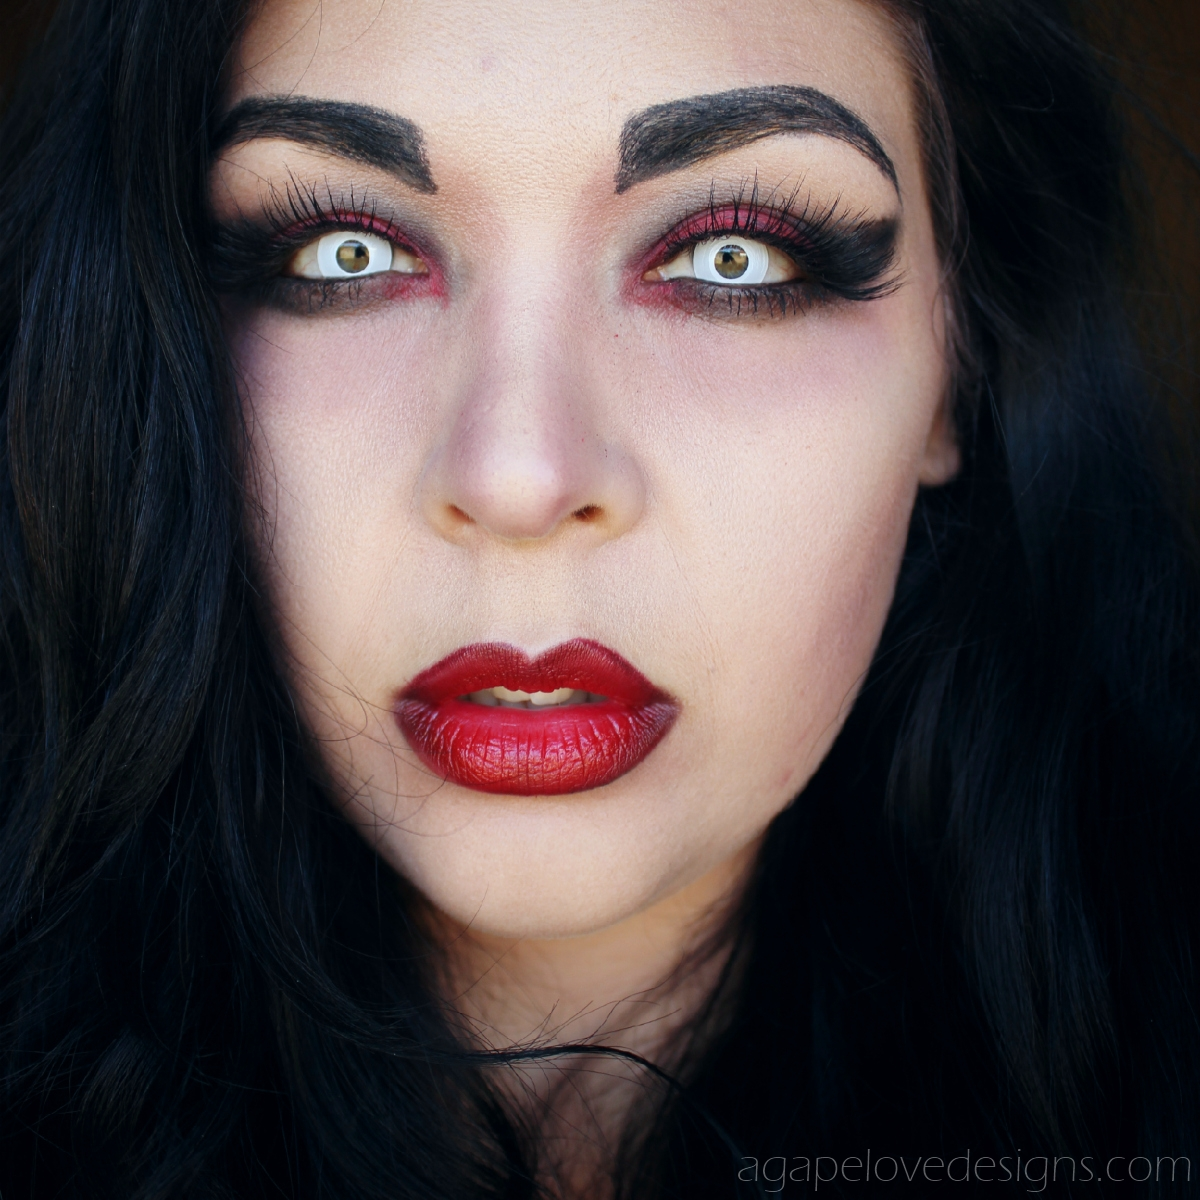 Agape Love Designs: Easy Vampire Makeup Tutorial (Video)